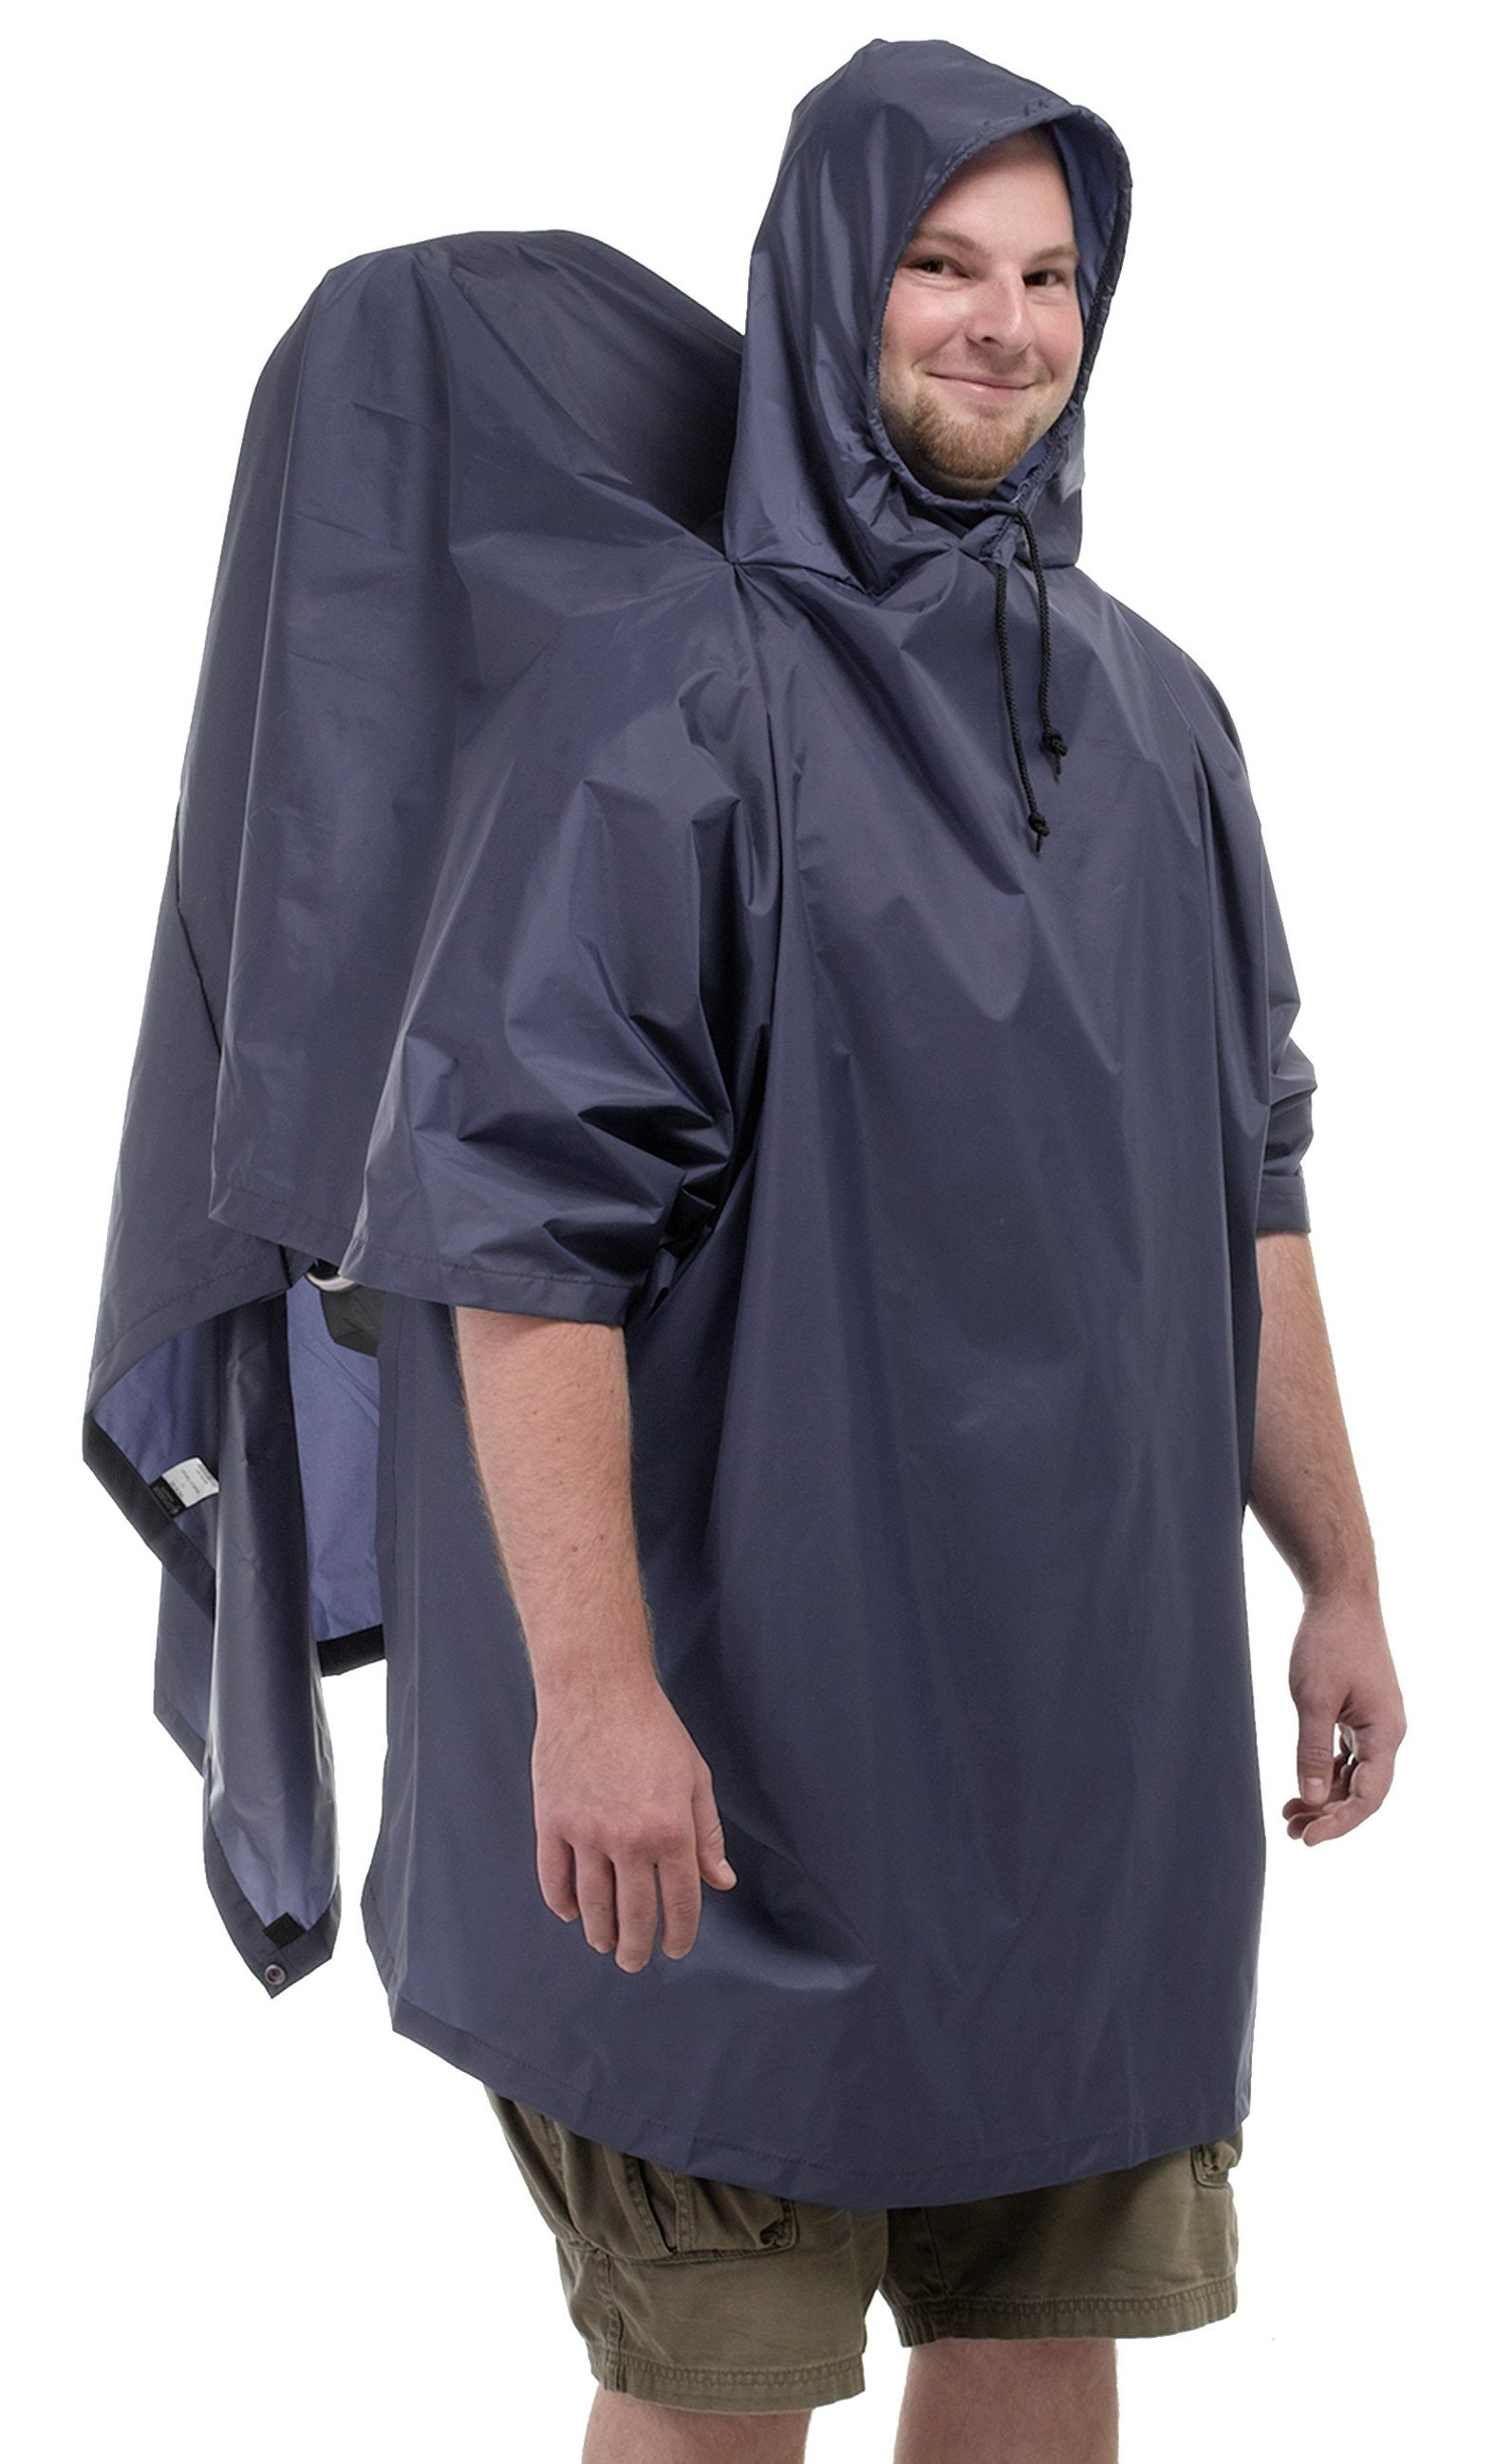 Outdoor Products Packframe Poncho At Rei Com Poncho Rain Gear Men Sleeve Shirt Men